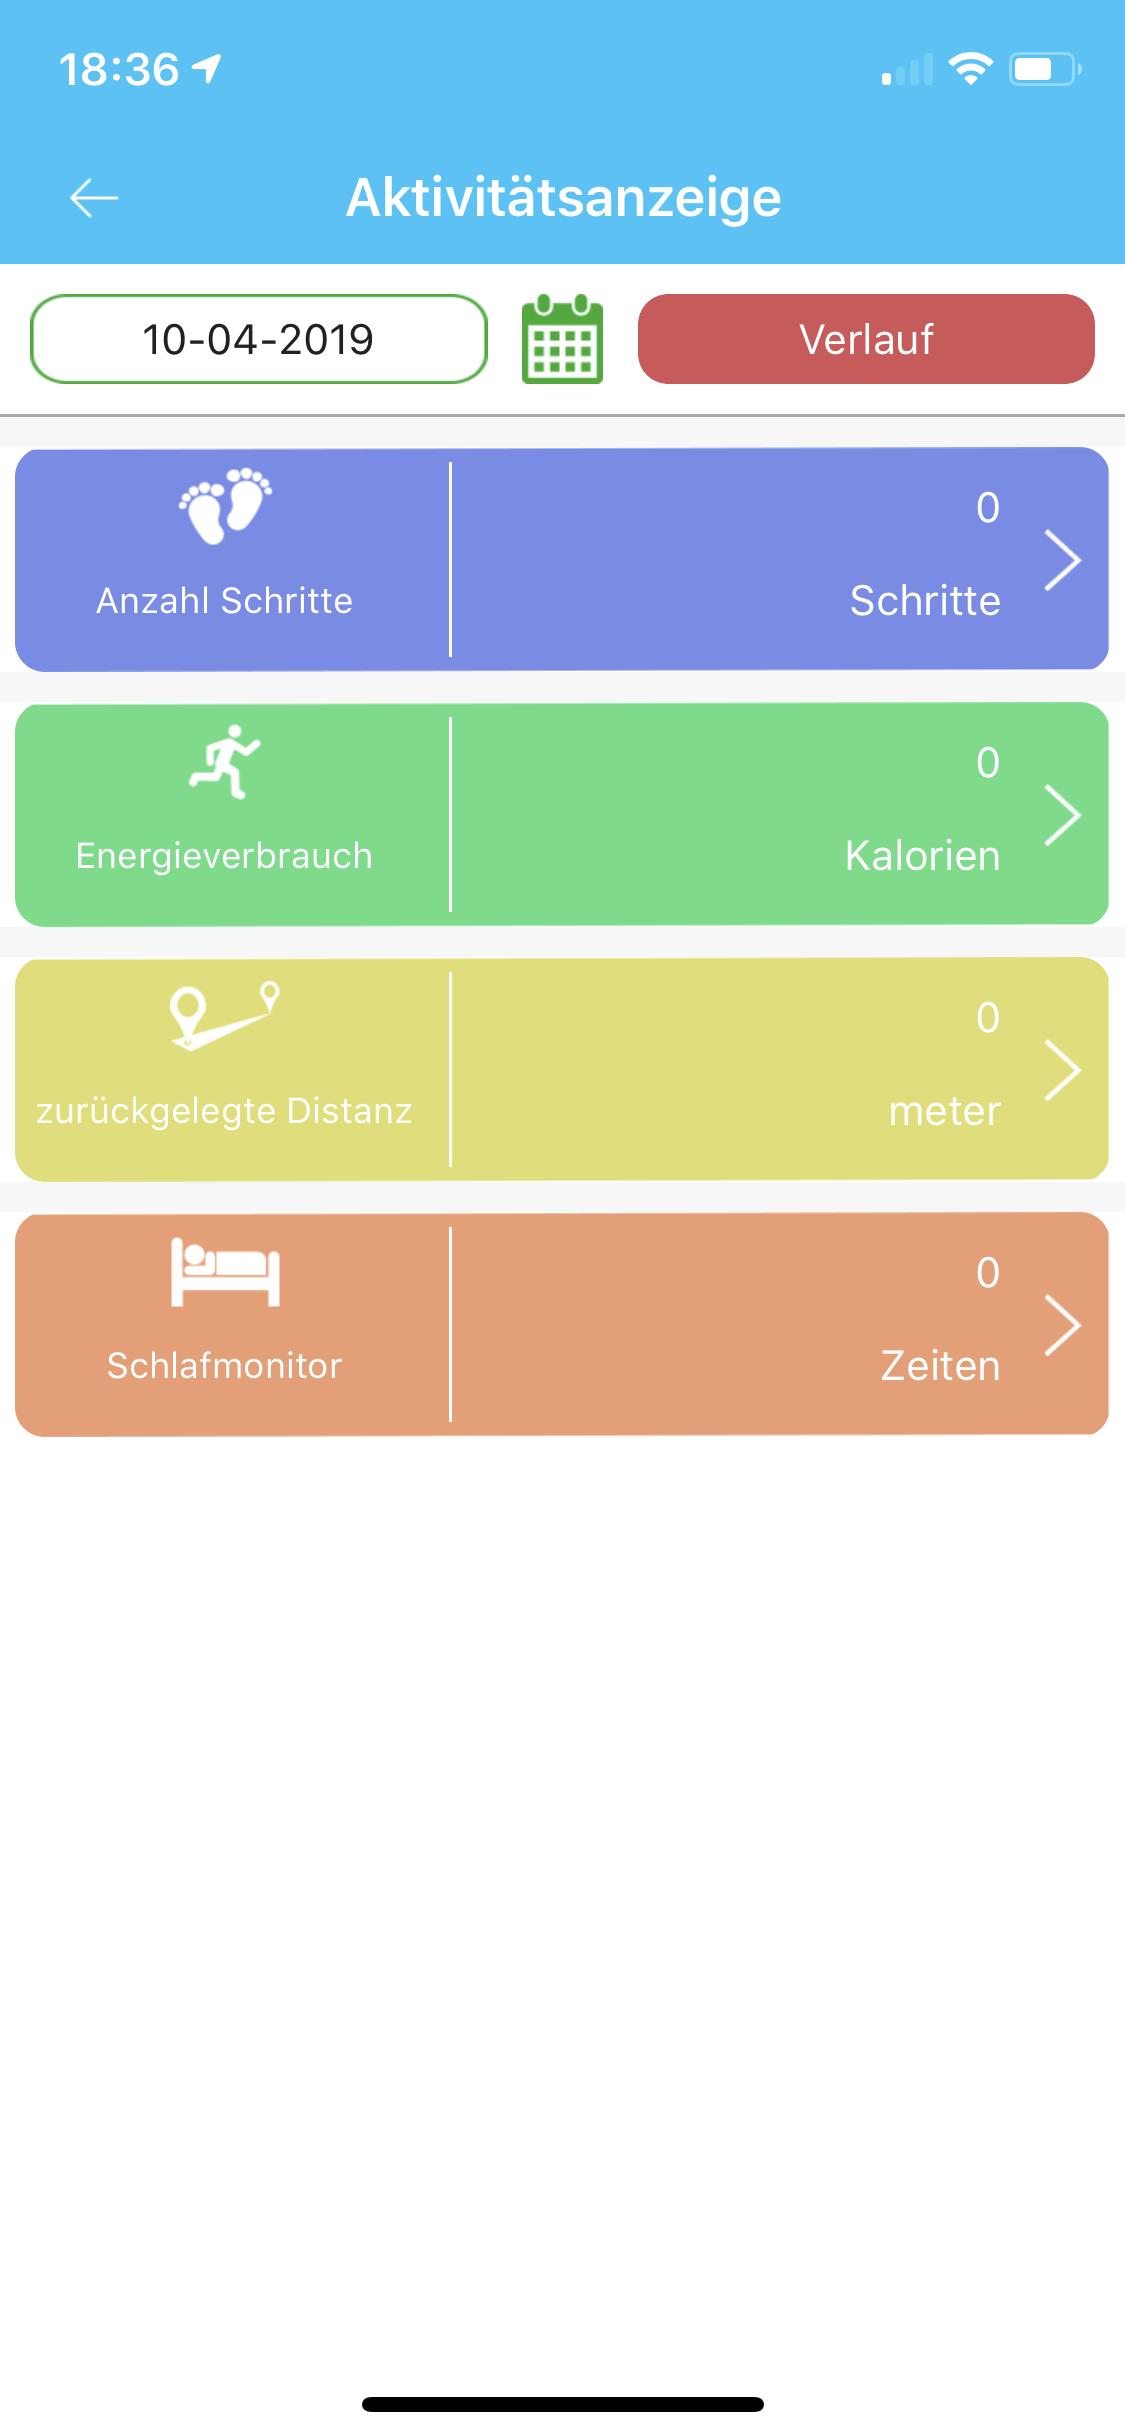 SE-Tracker-App Aktivitätsanzeige